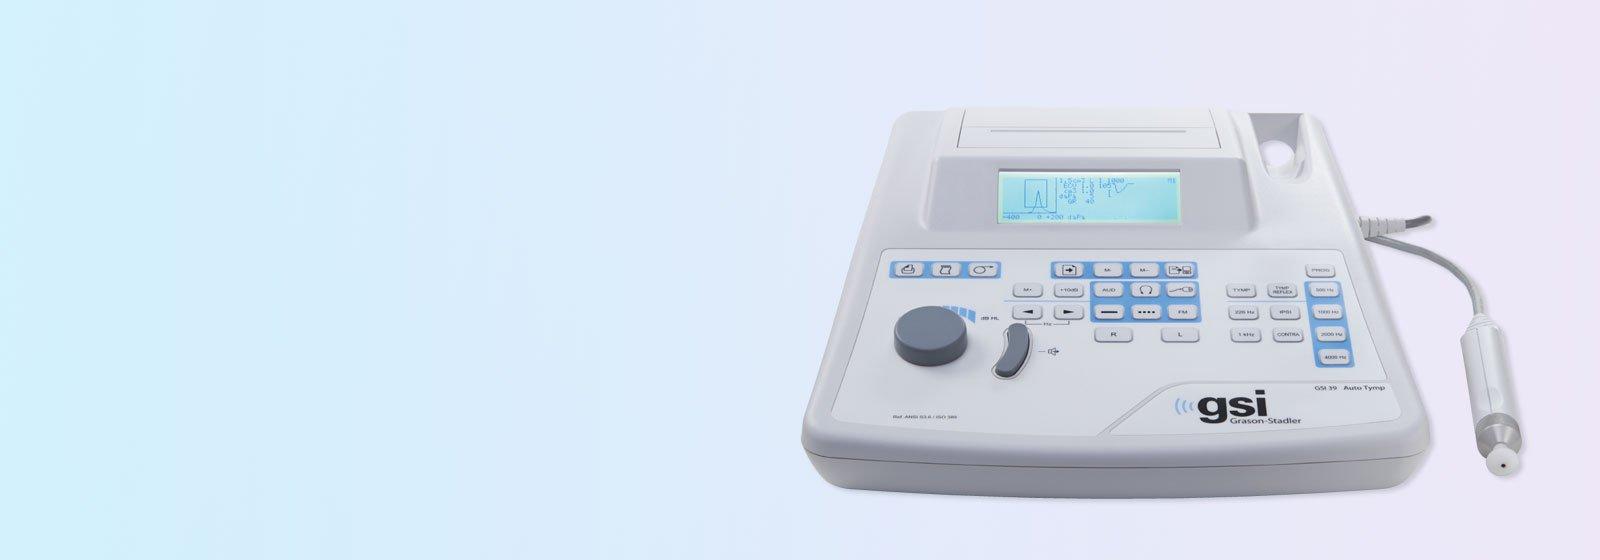 Producto GSI 39